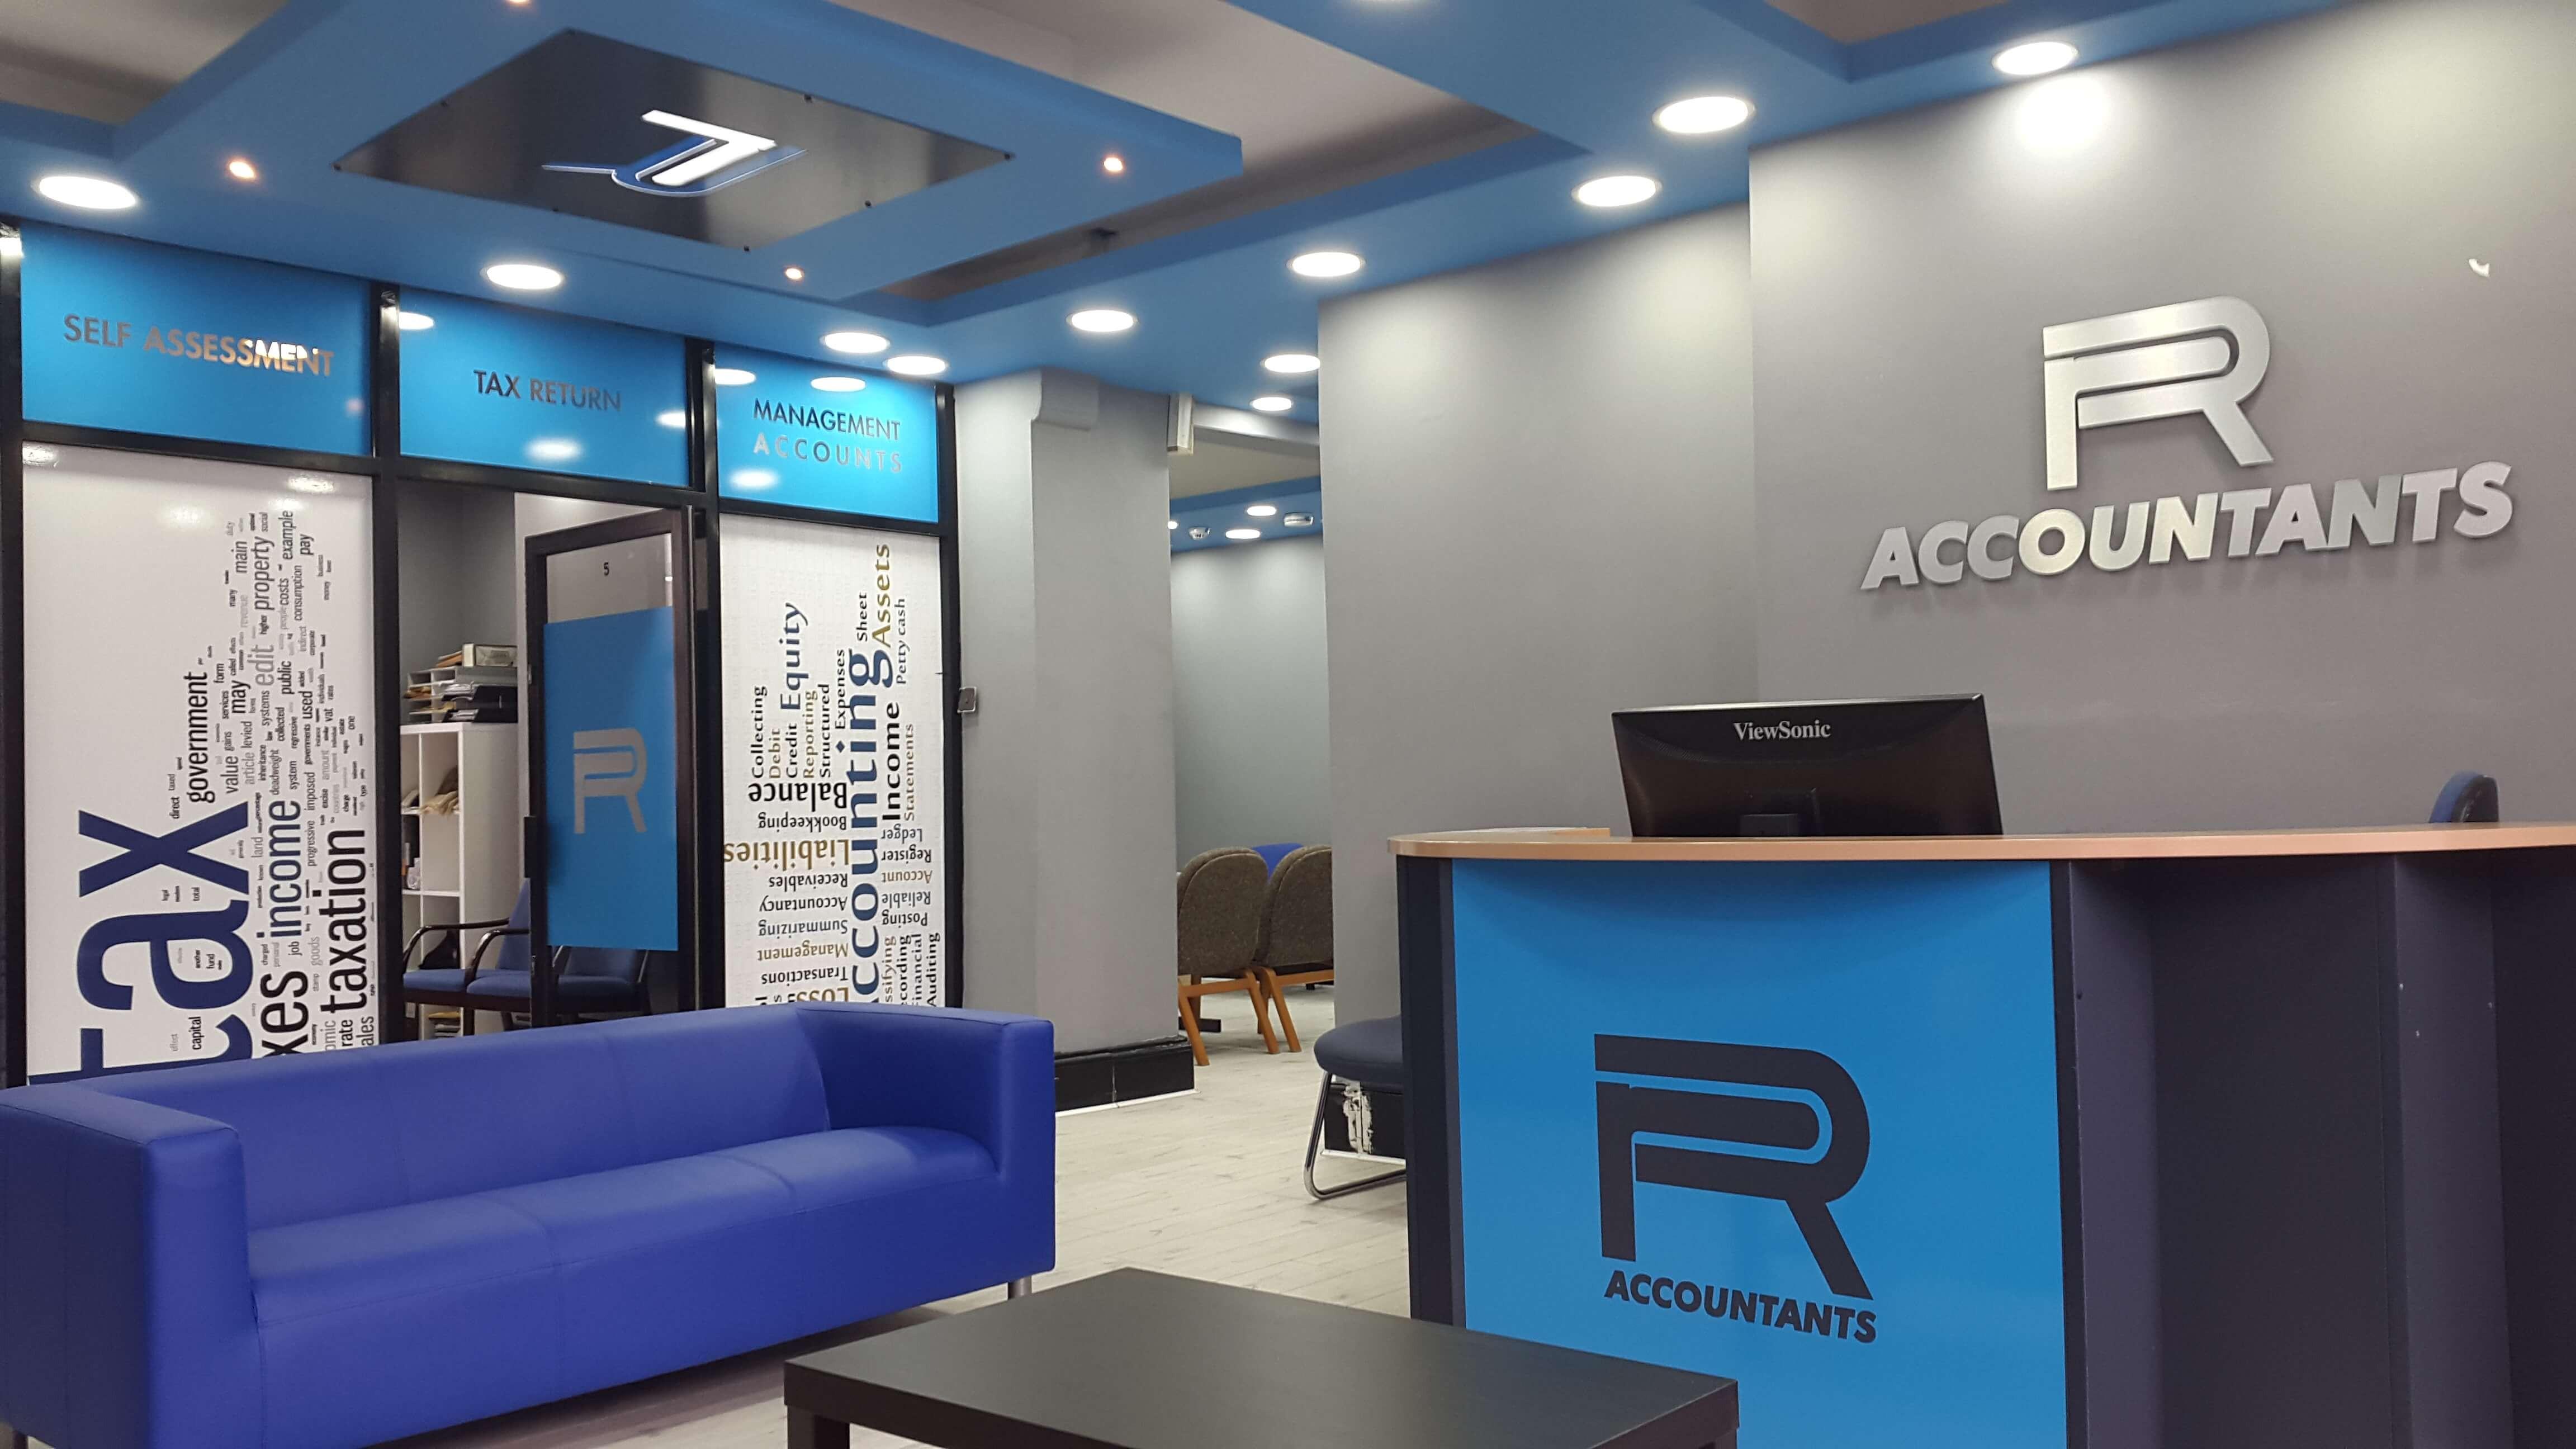 R R ACCOUNTANTS LTD | LinkedIn